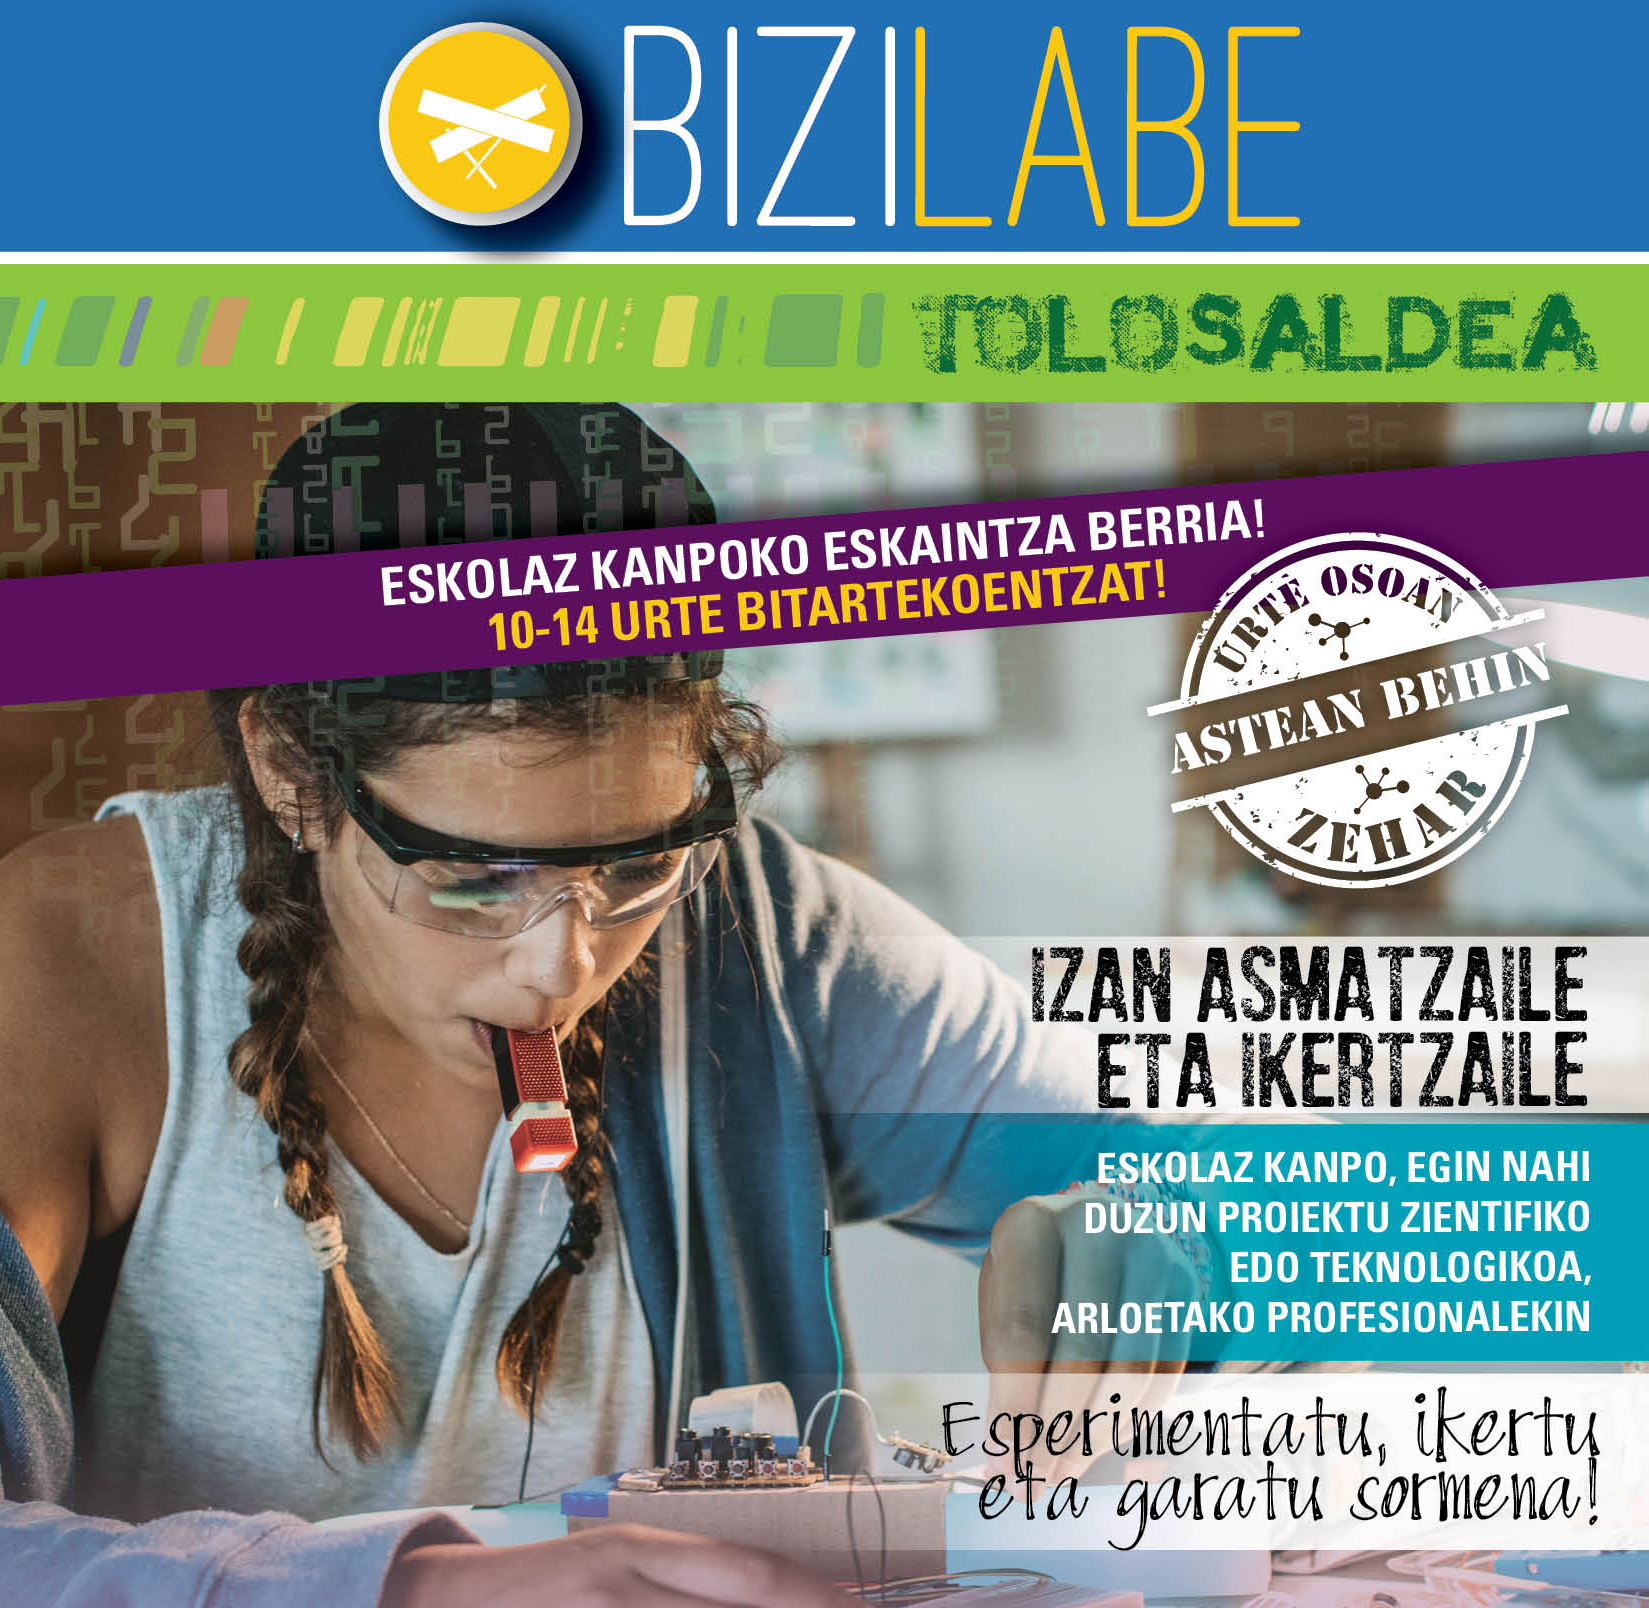 BZL Tolosaldea 2020-2021_tailer-portada.jpg